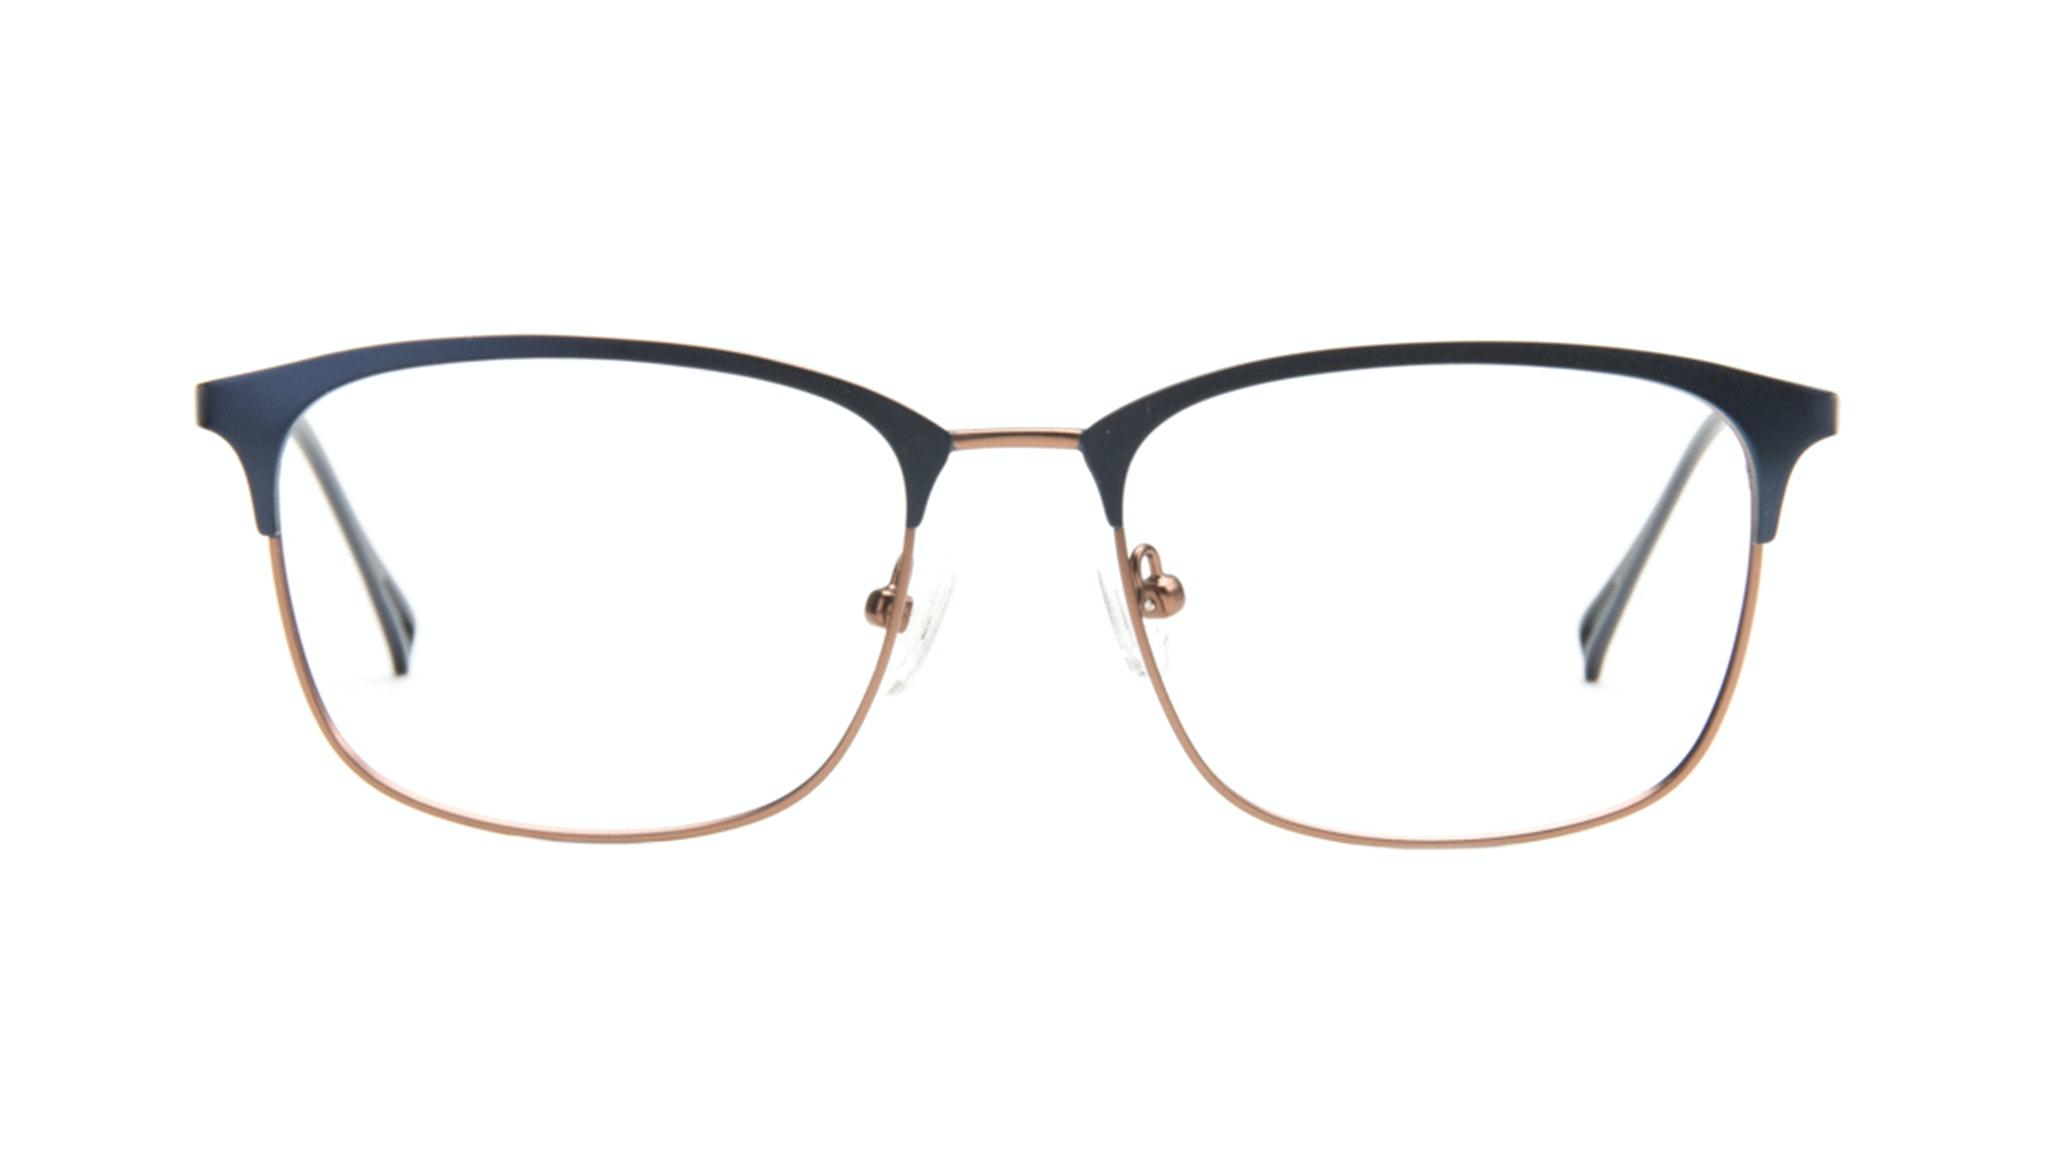 Affordable Fashion Glasses Rectangle Eyeglasses Women Seaside Marine Front